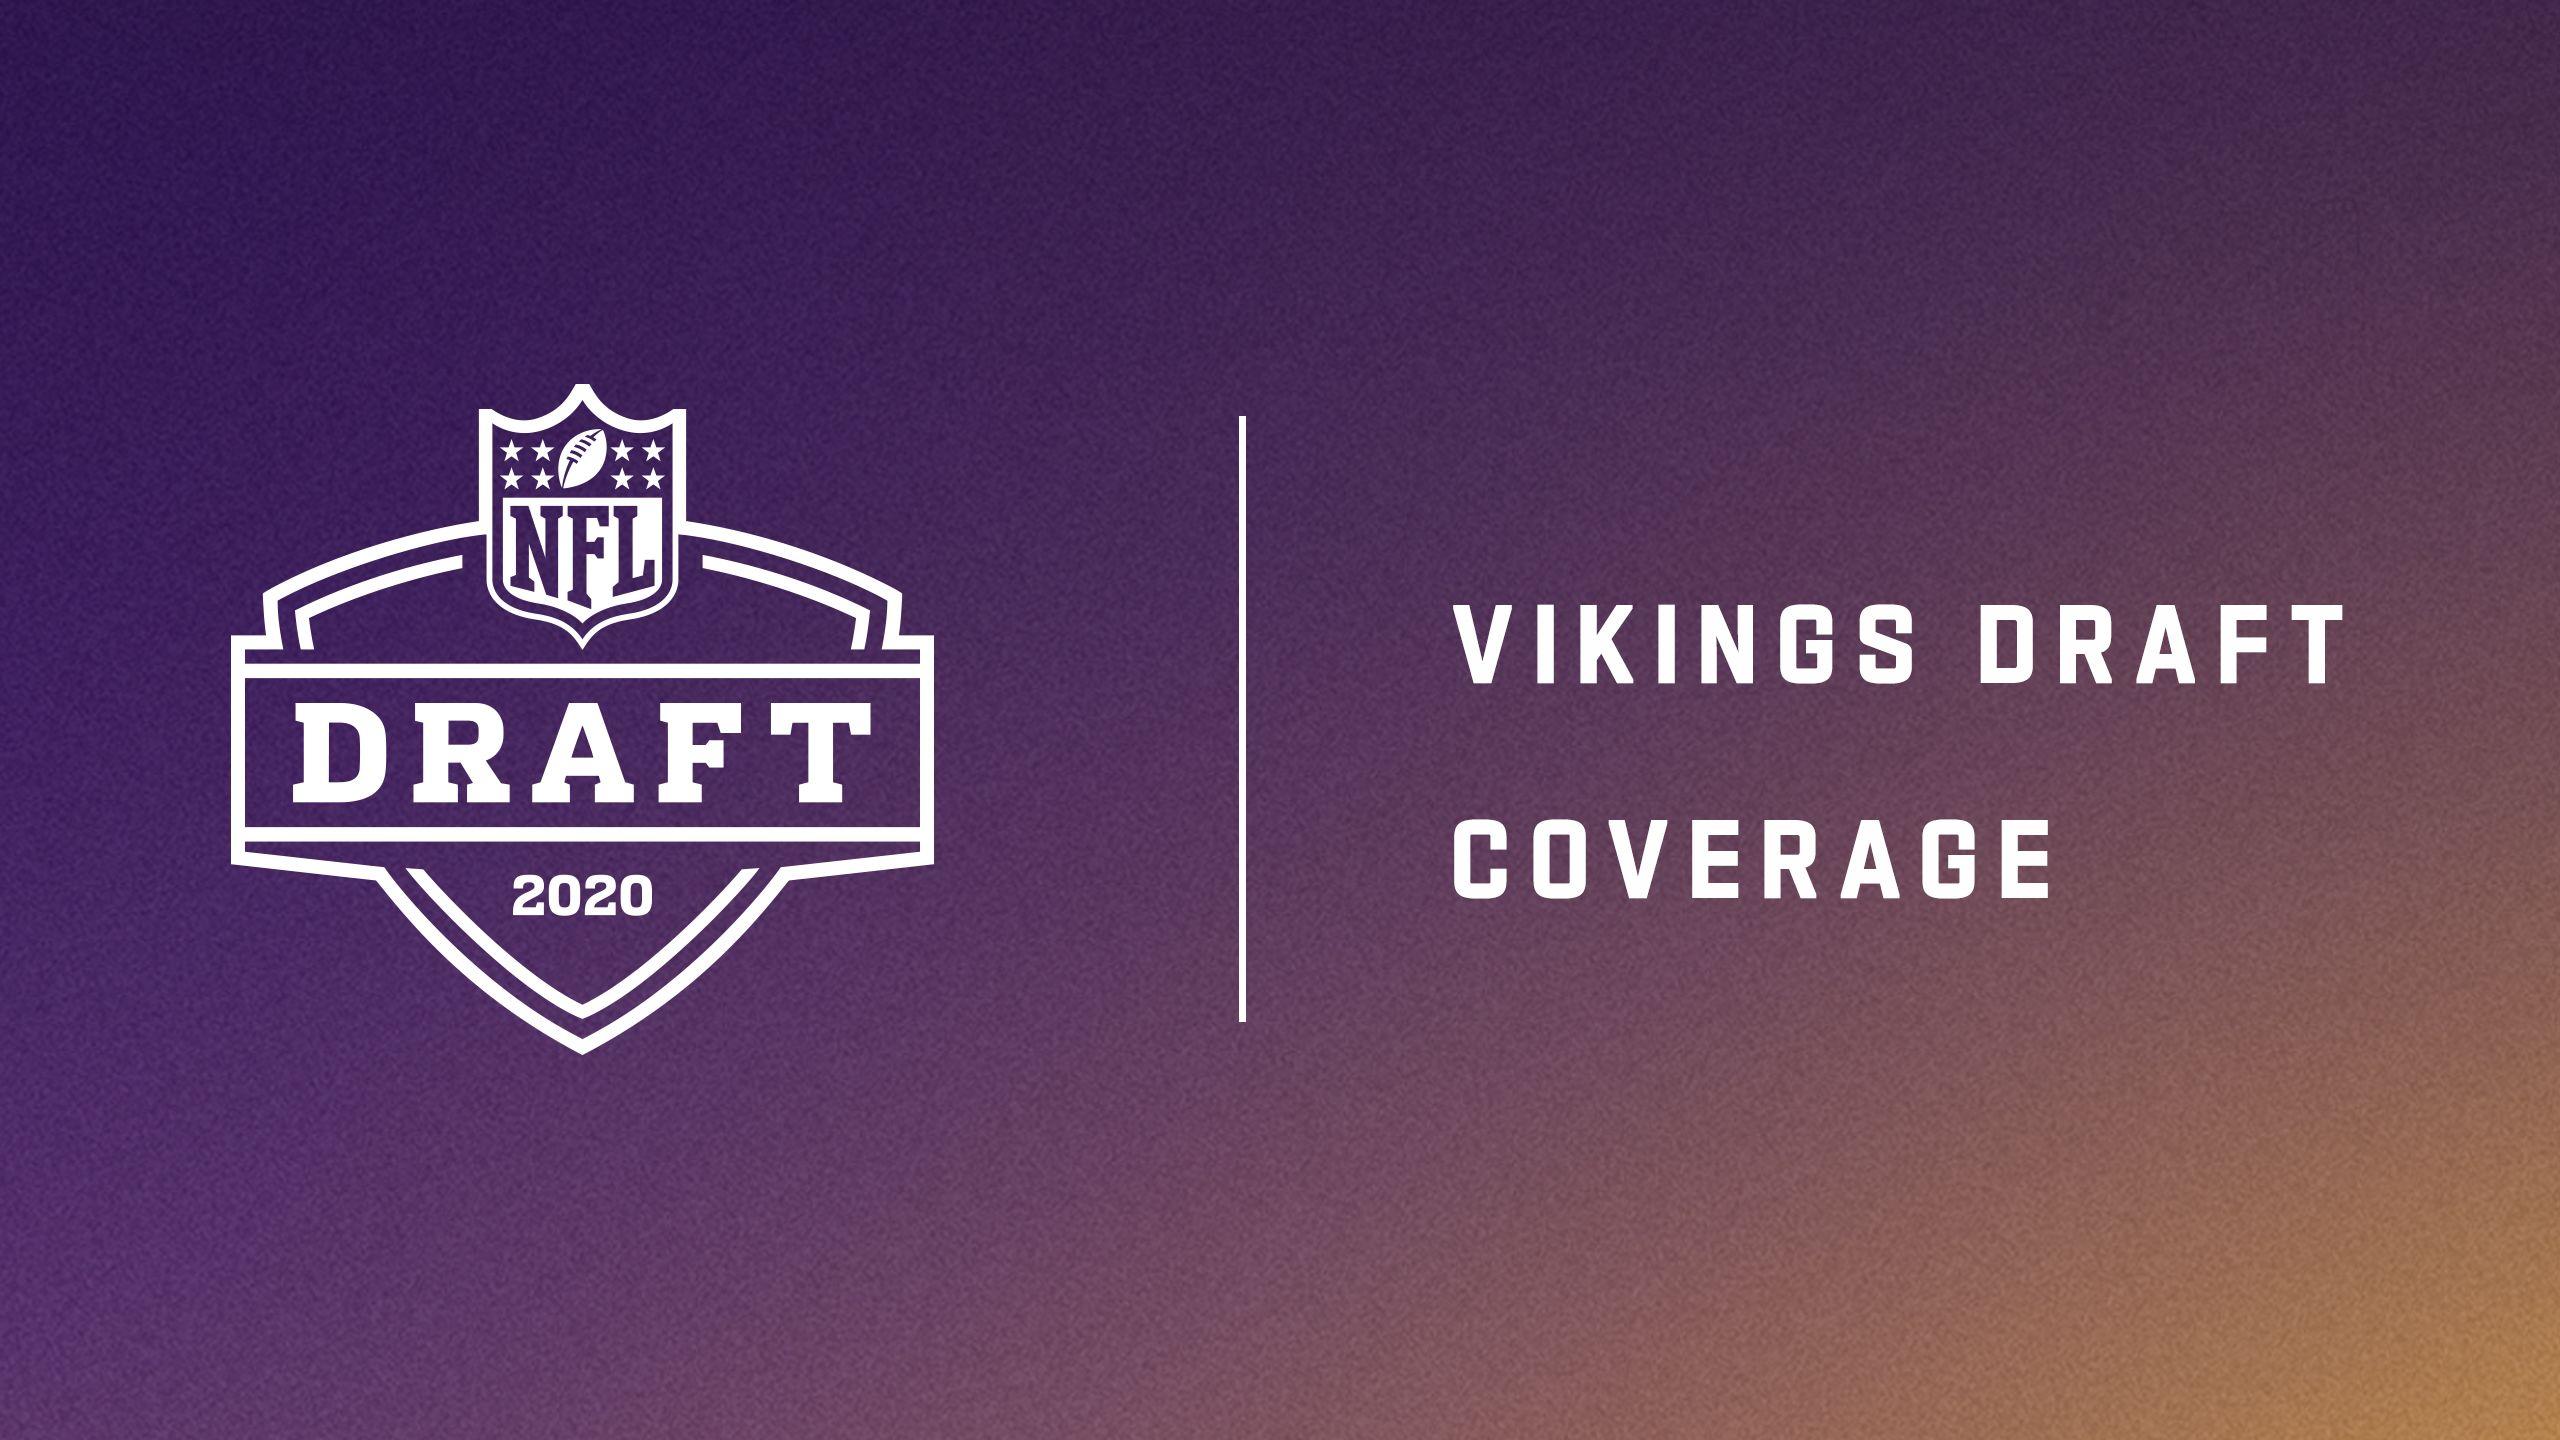 Vikings Draft Coverage